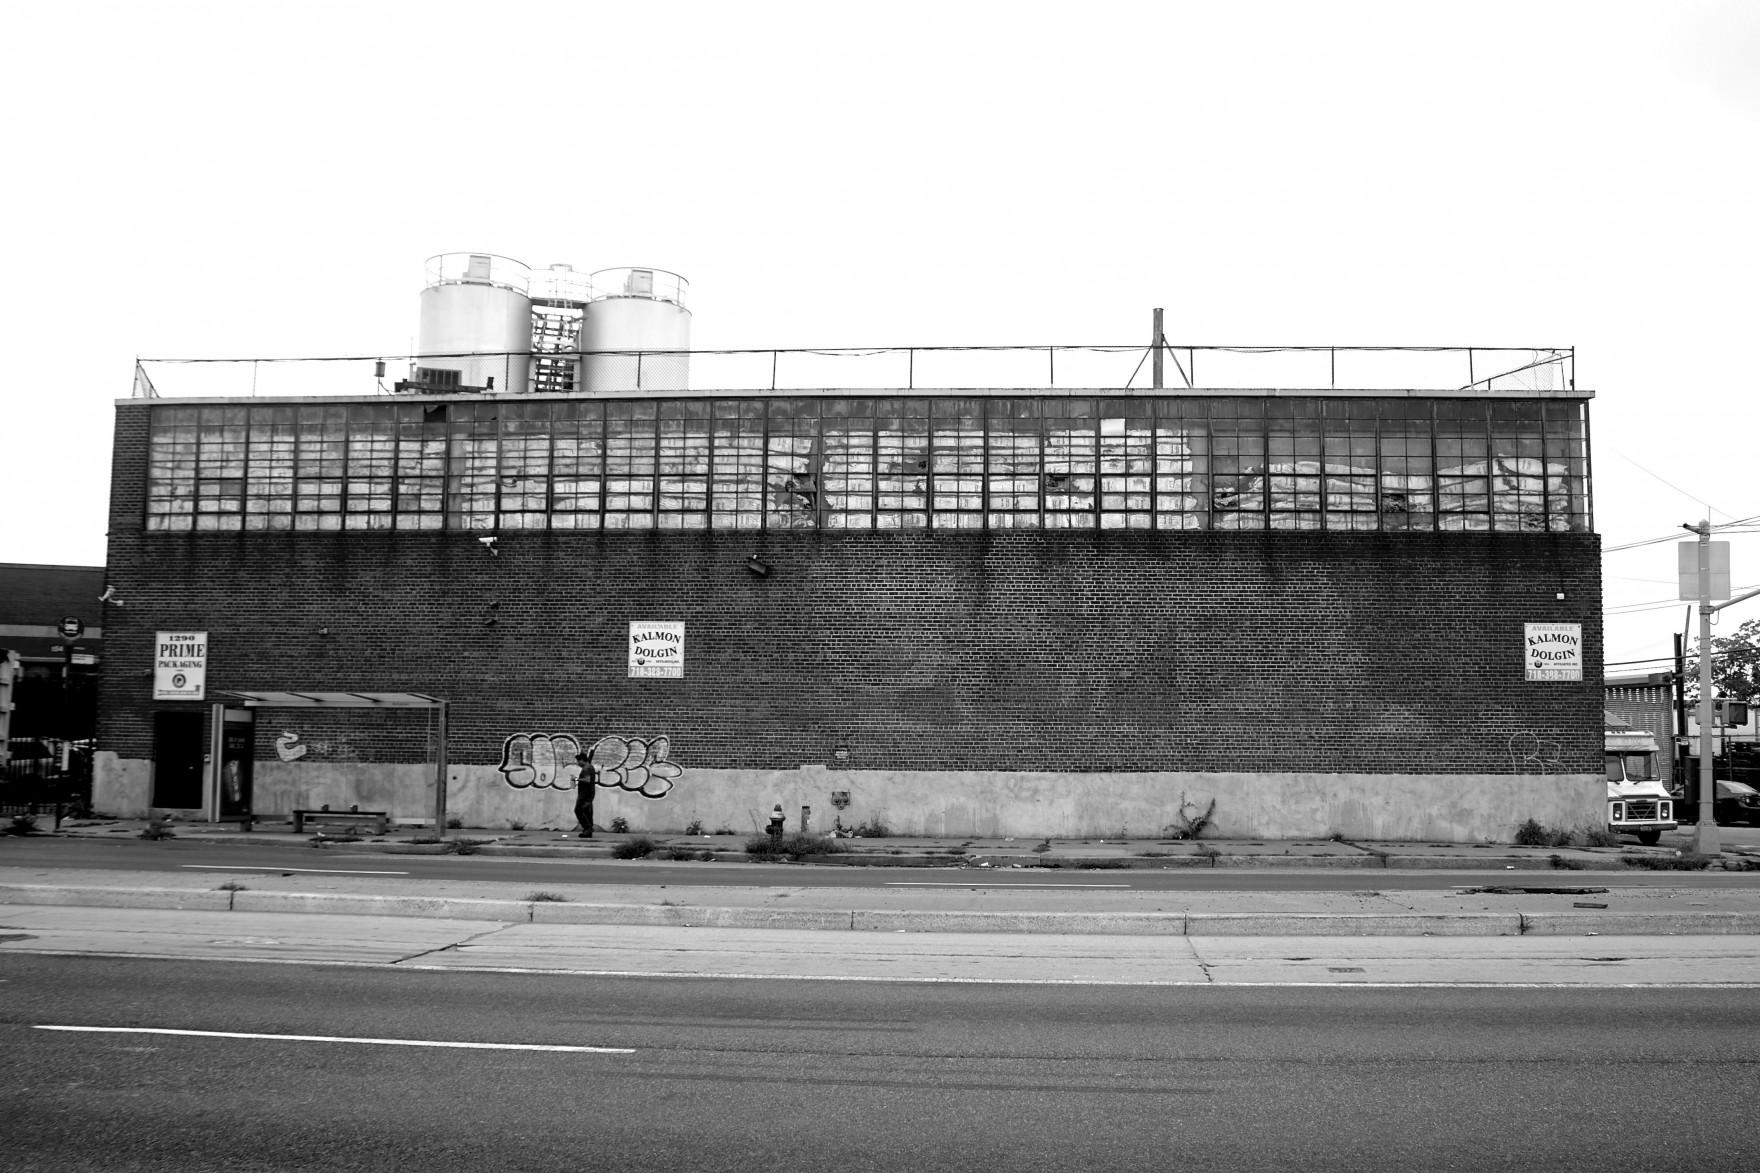 Industrial Brooklyn 15- The Bored Vegetarian Bethany Pickard